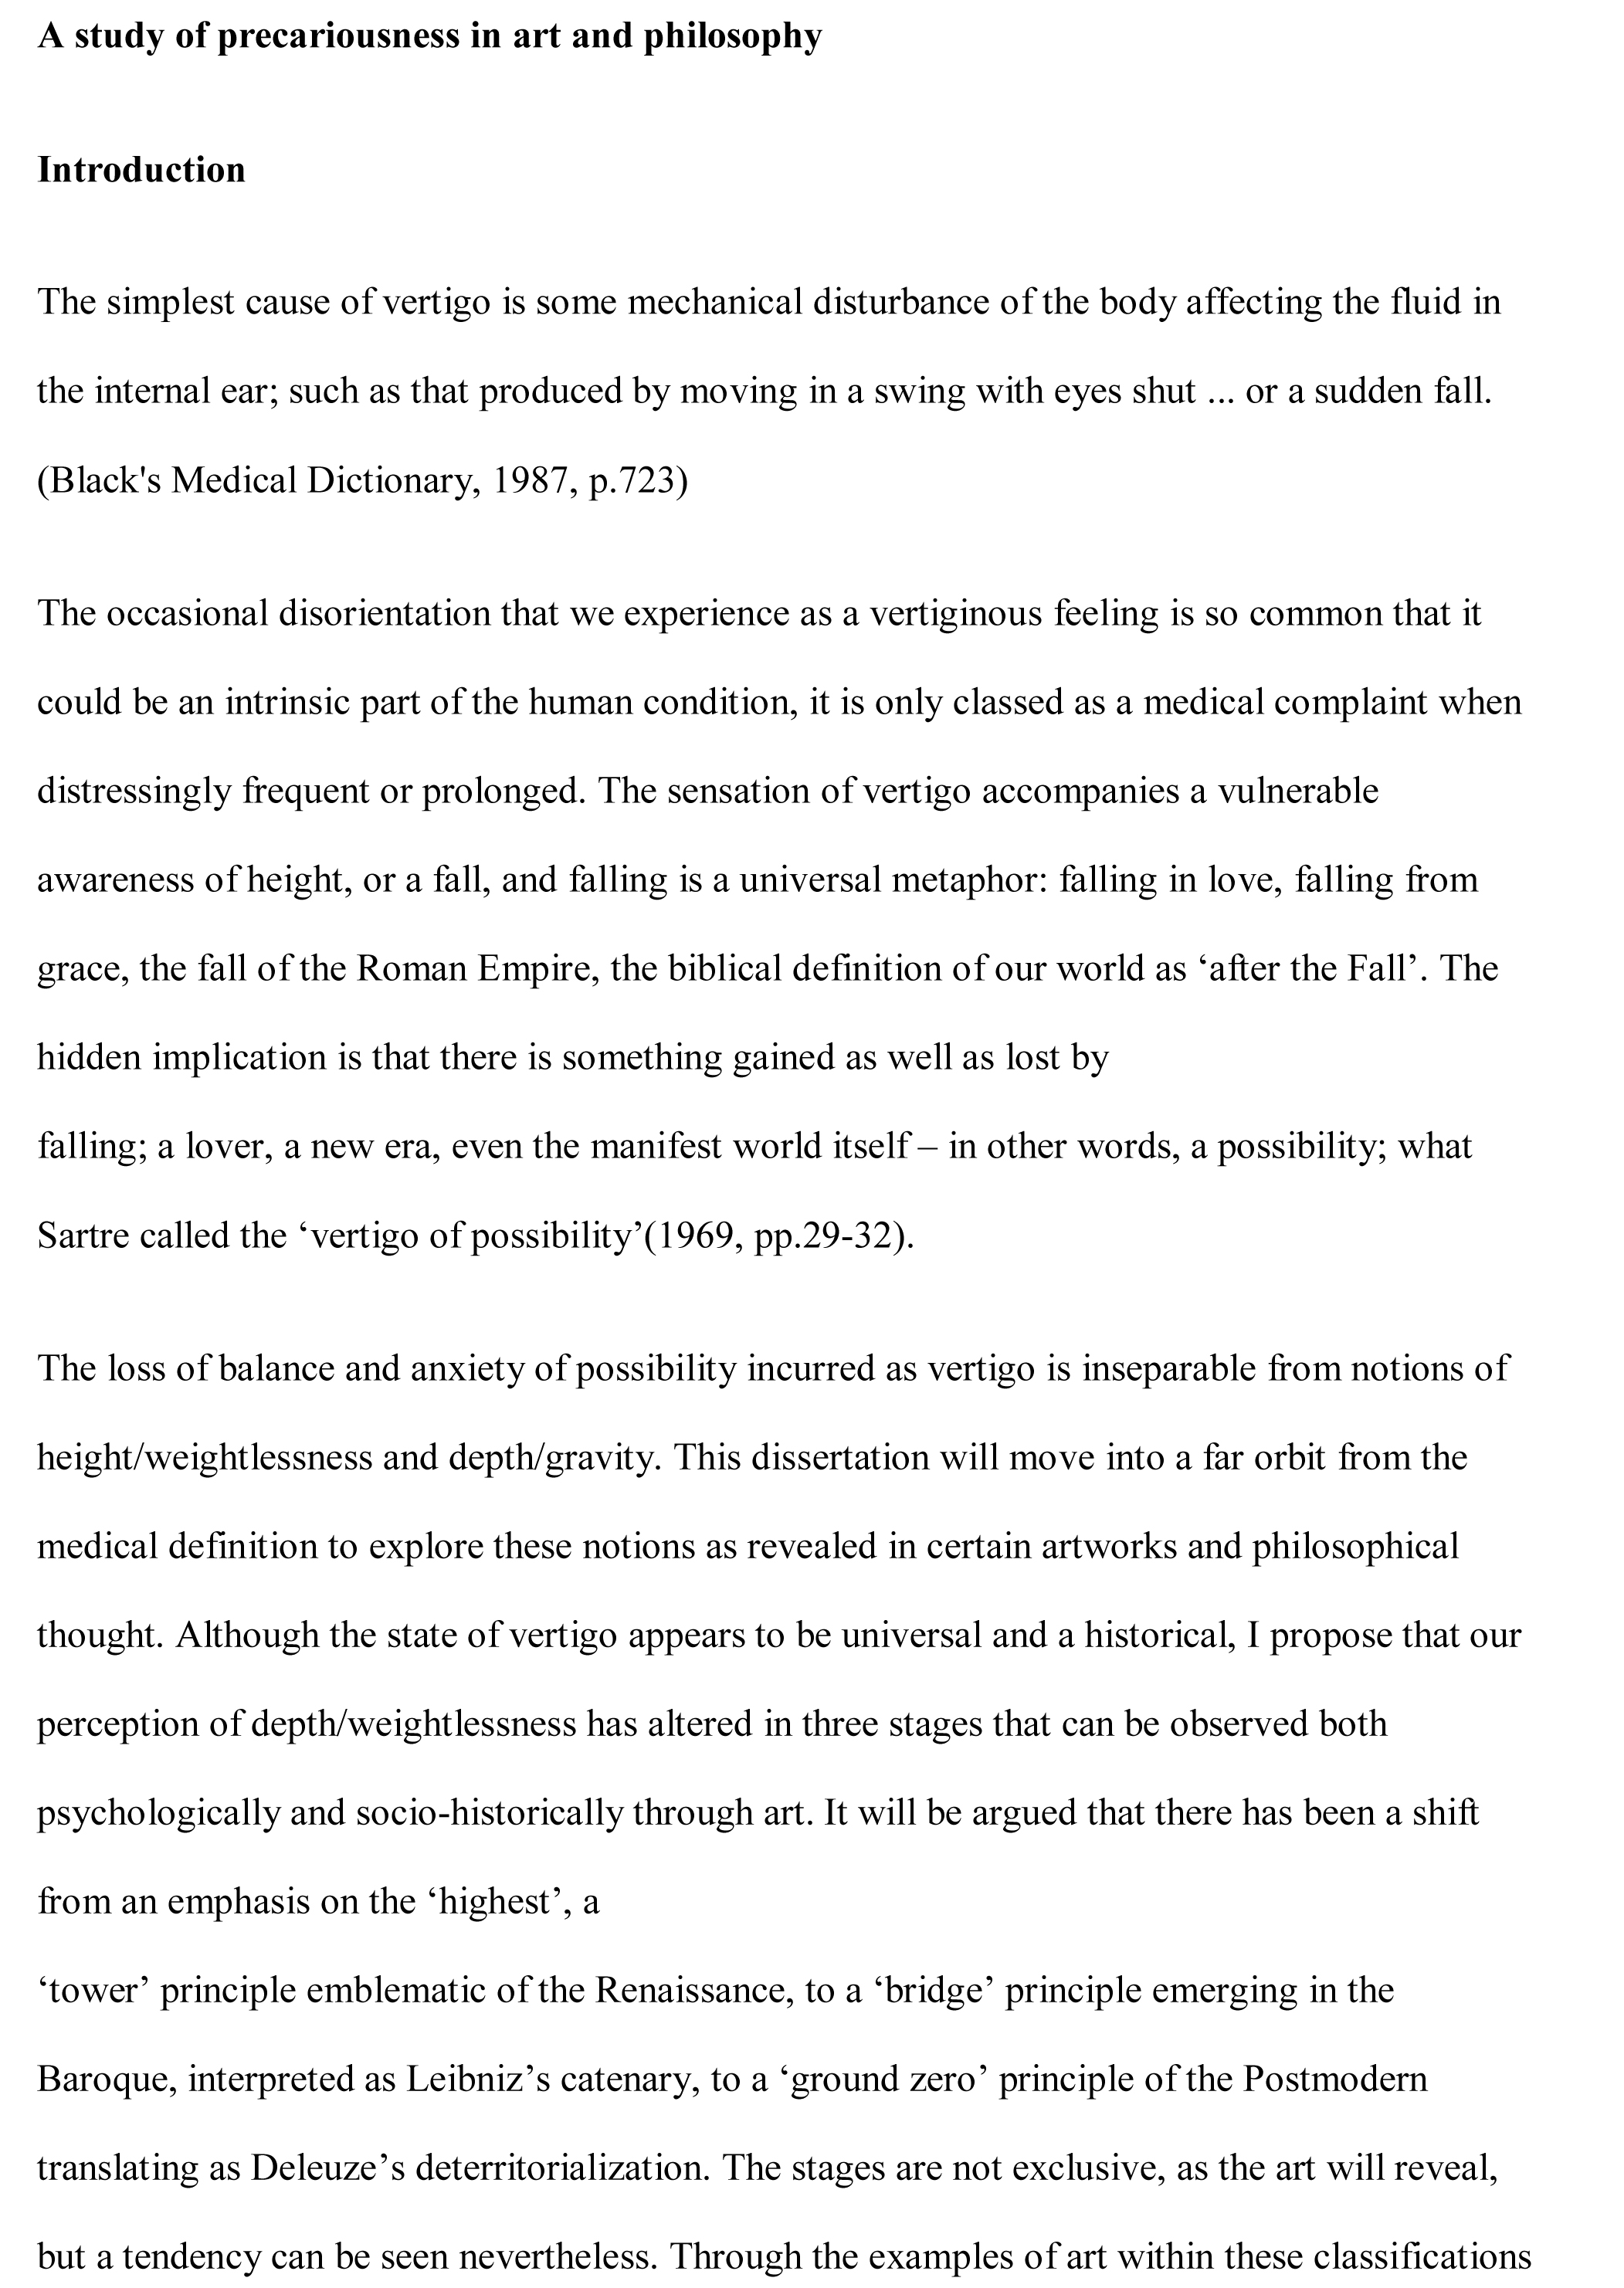 017 Essay Example Sample Act Essays Art Coursework Wonderful New Full